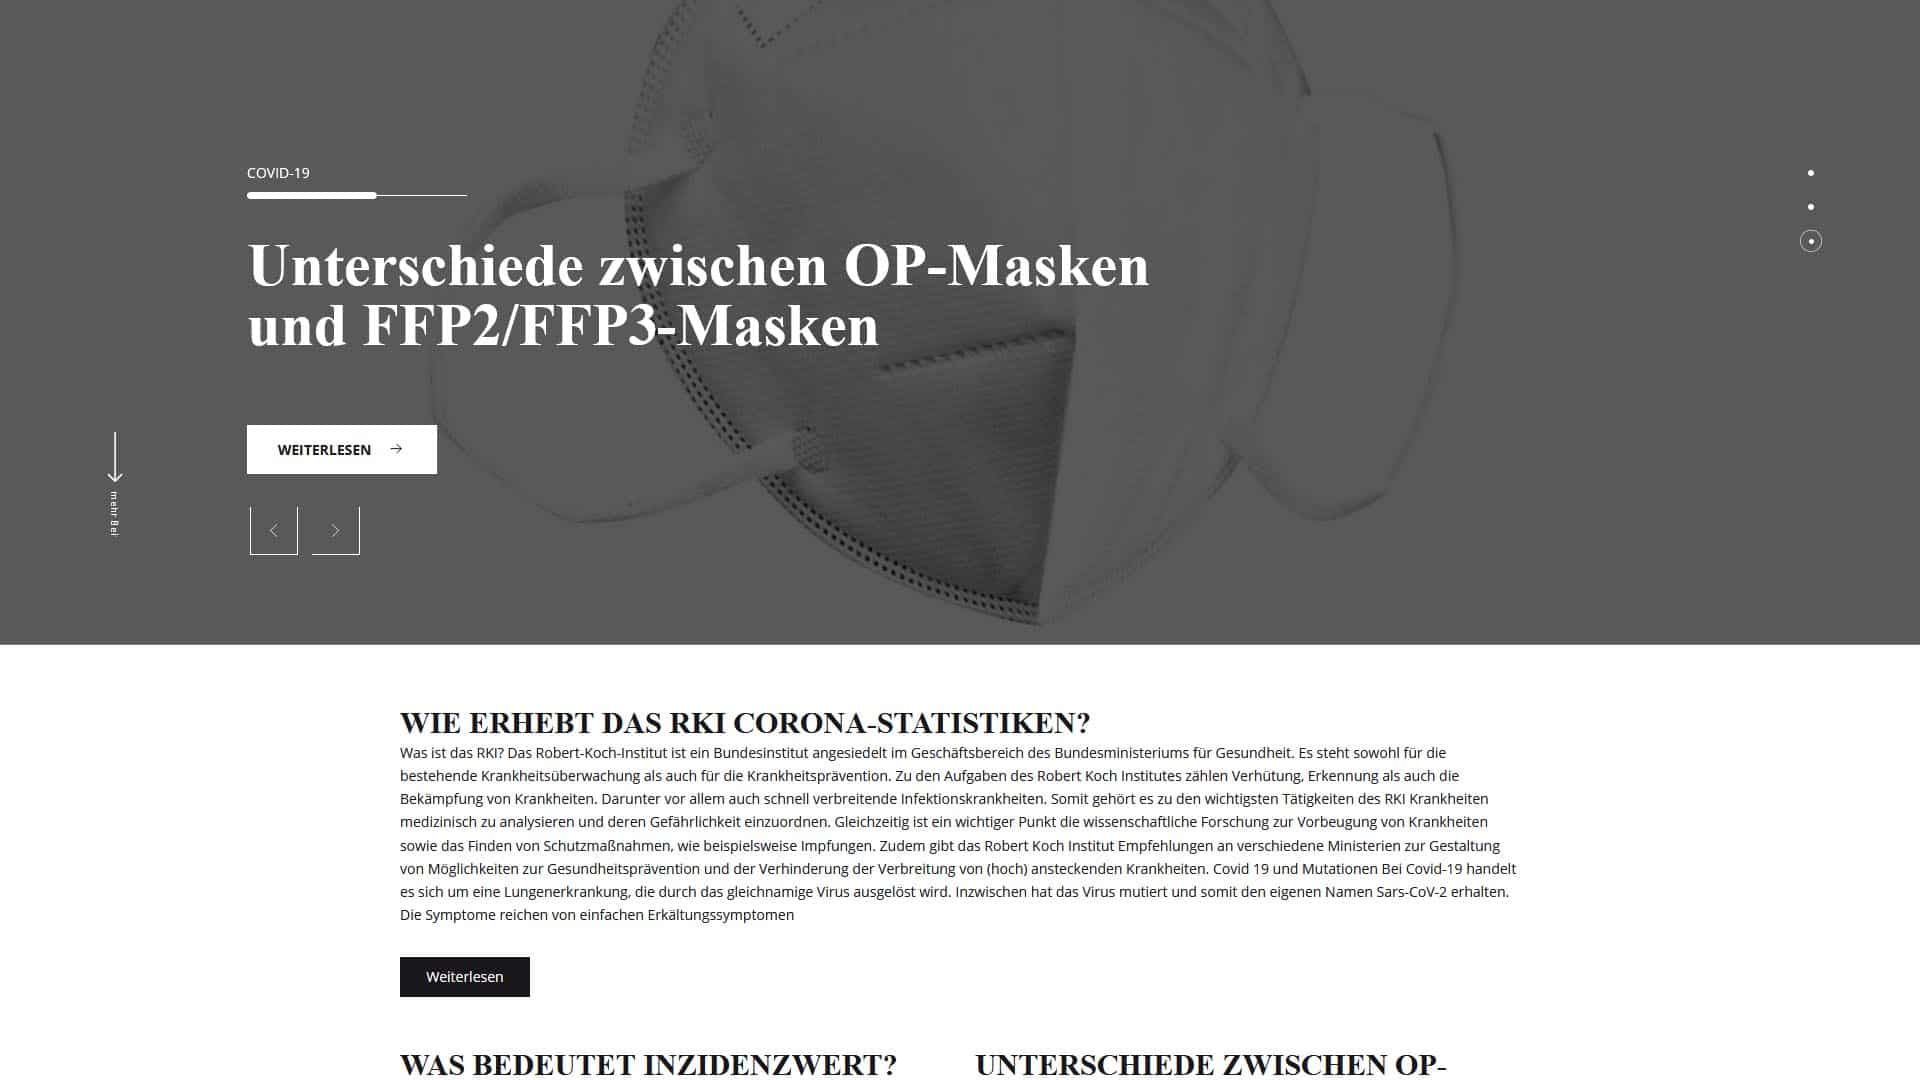 msk industrieservice atemschutzmasken ffp2 relaunch 9